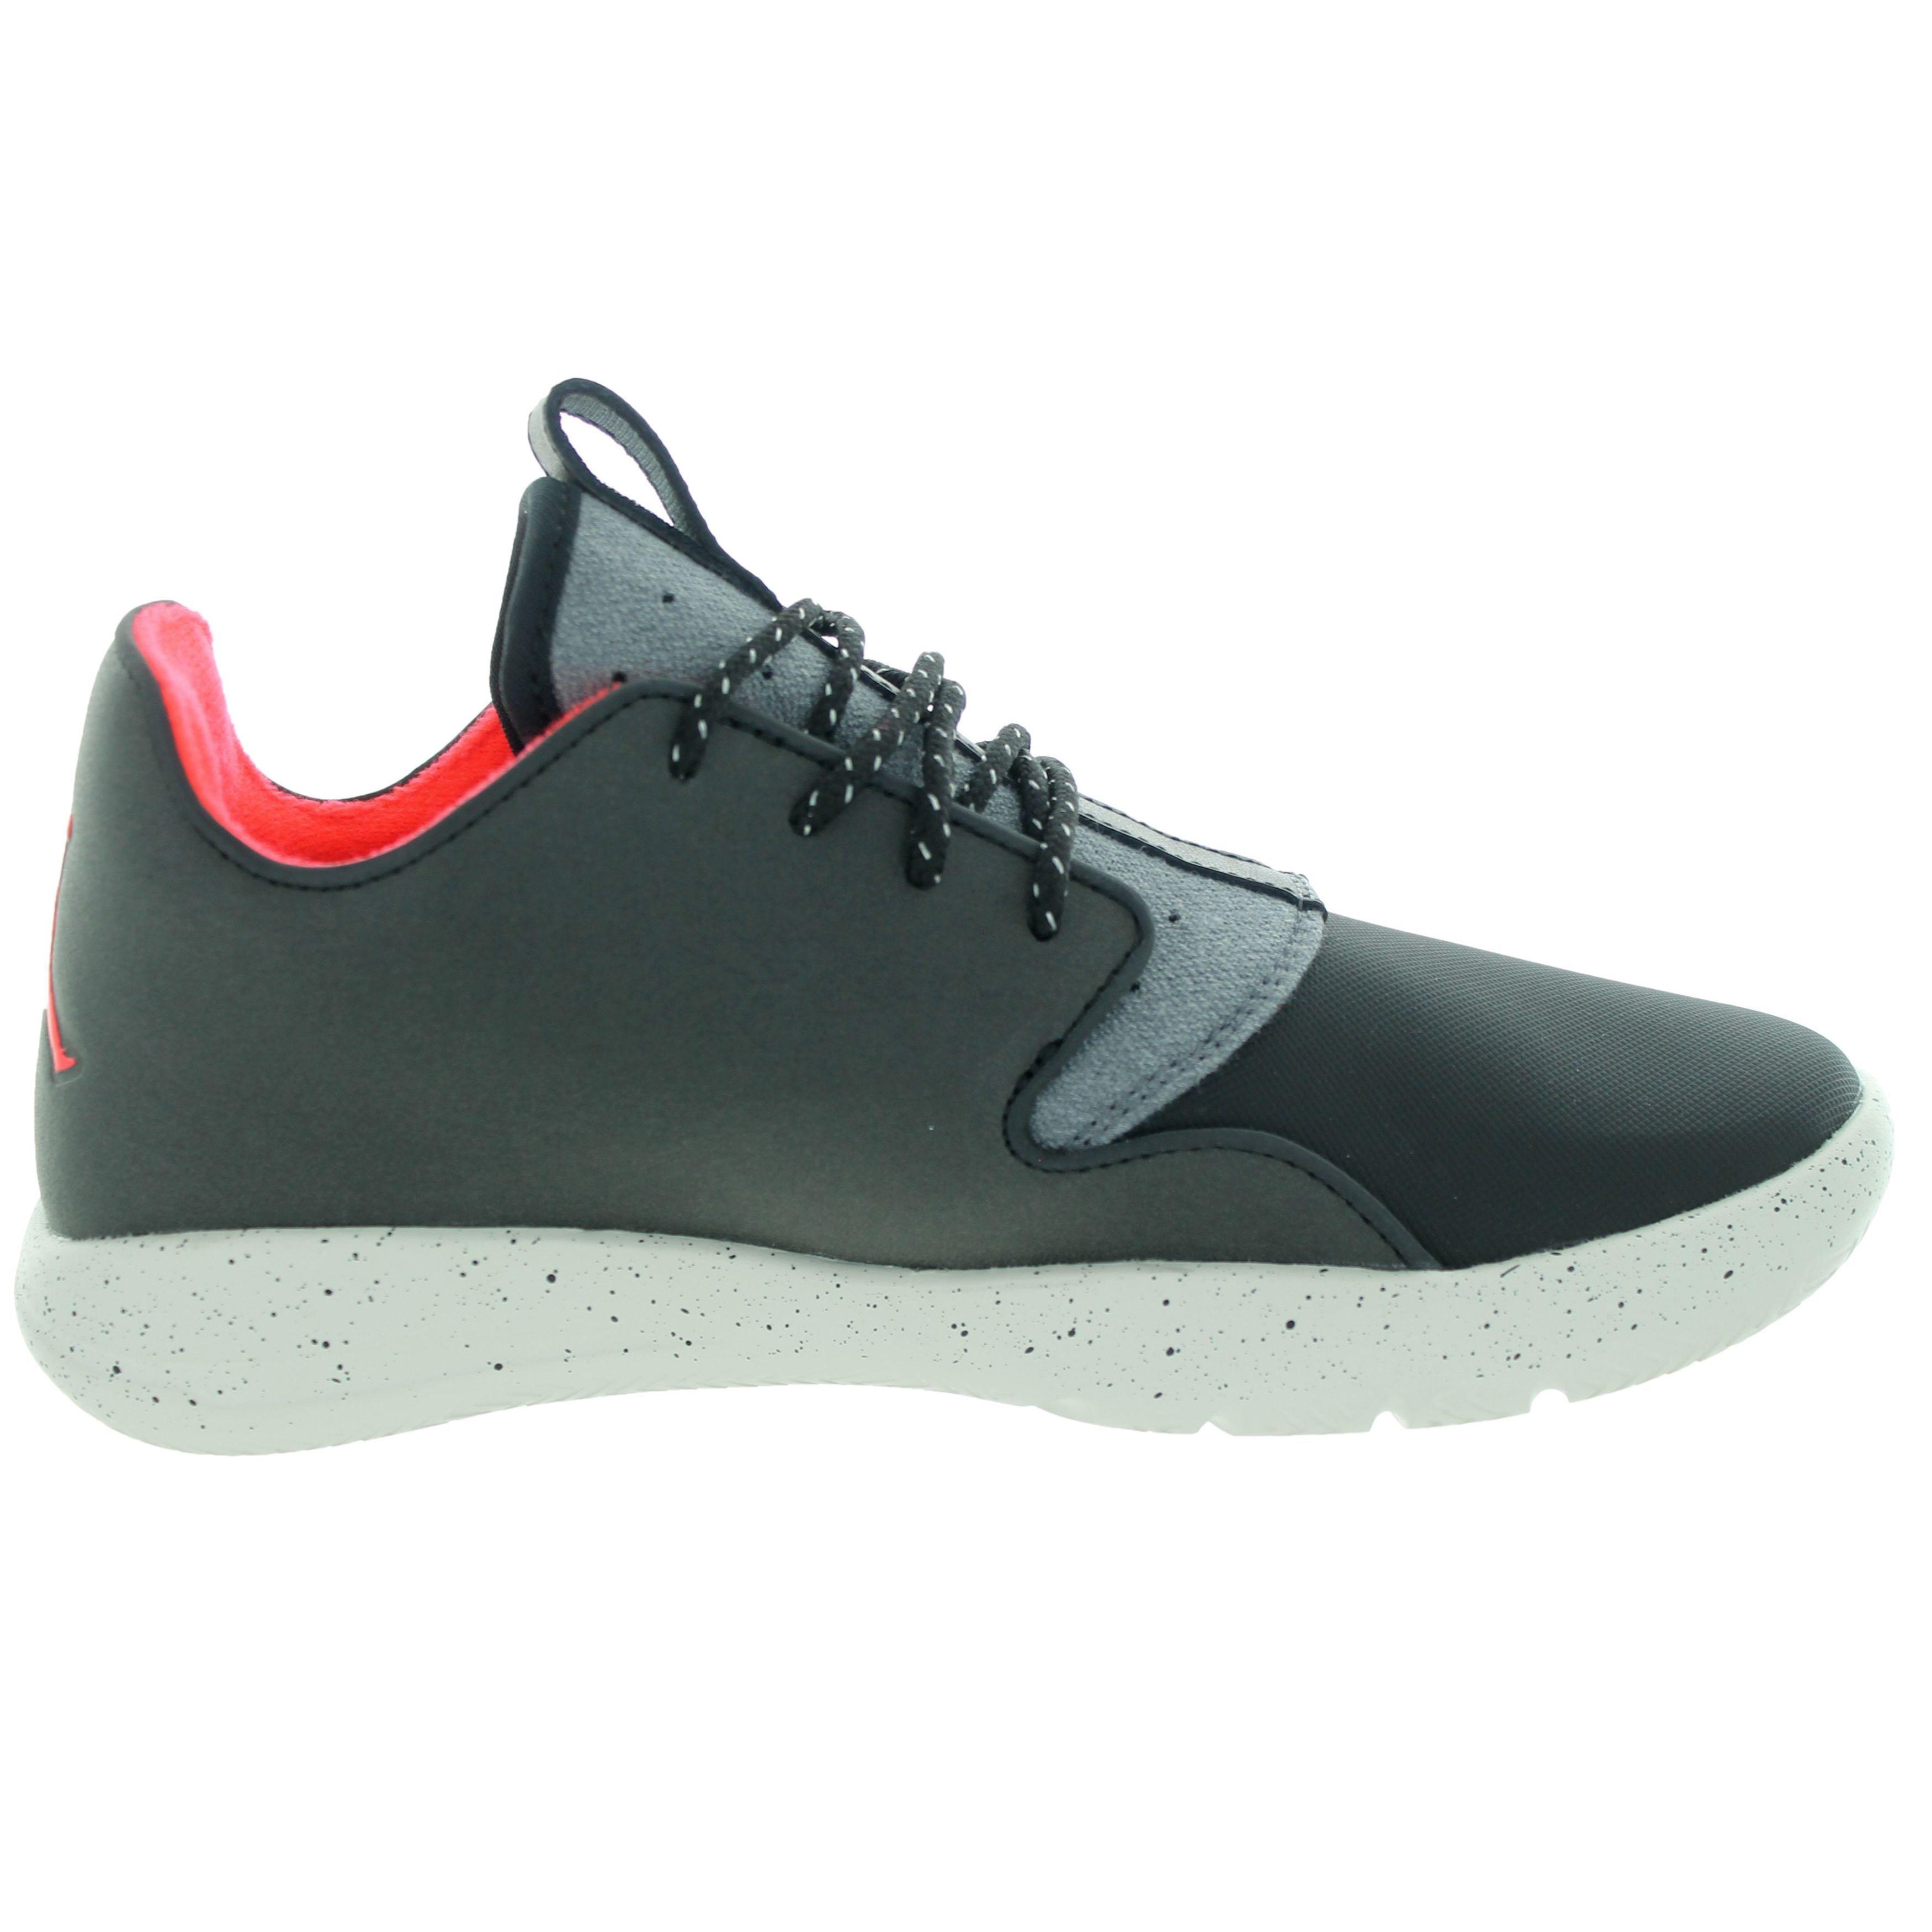 37ad22a794d1 Shop Nike Jordan Kids  Jordan Eclipse Holiday Black Black Dark Grey  Basketball Shoes - Free Shipping Today - Overstock - 12362244